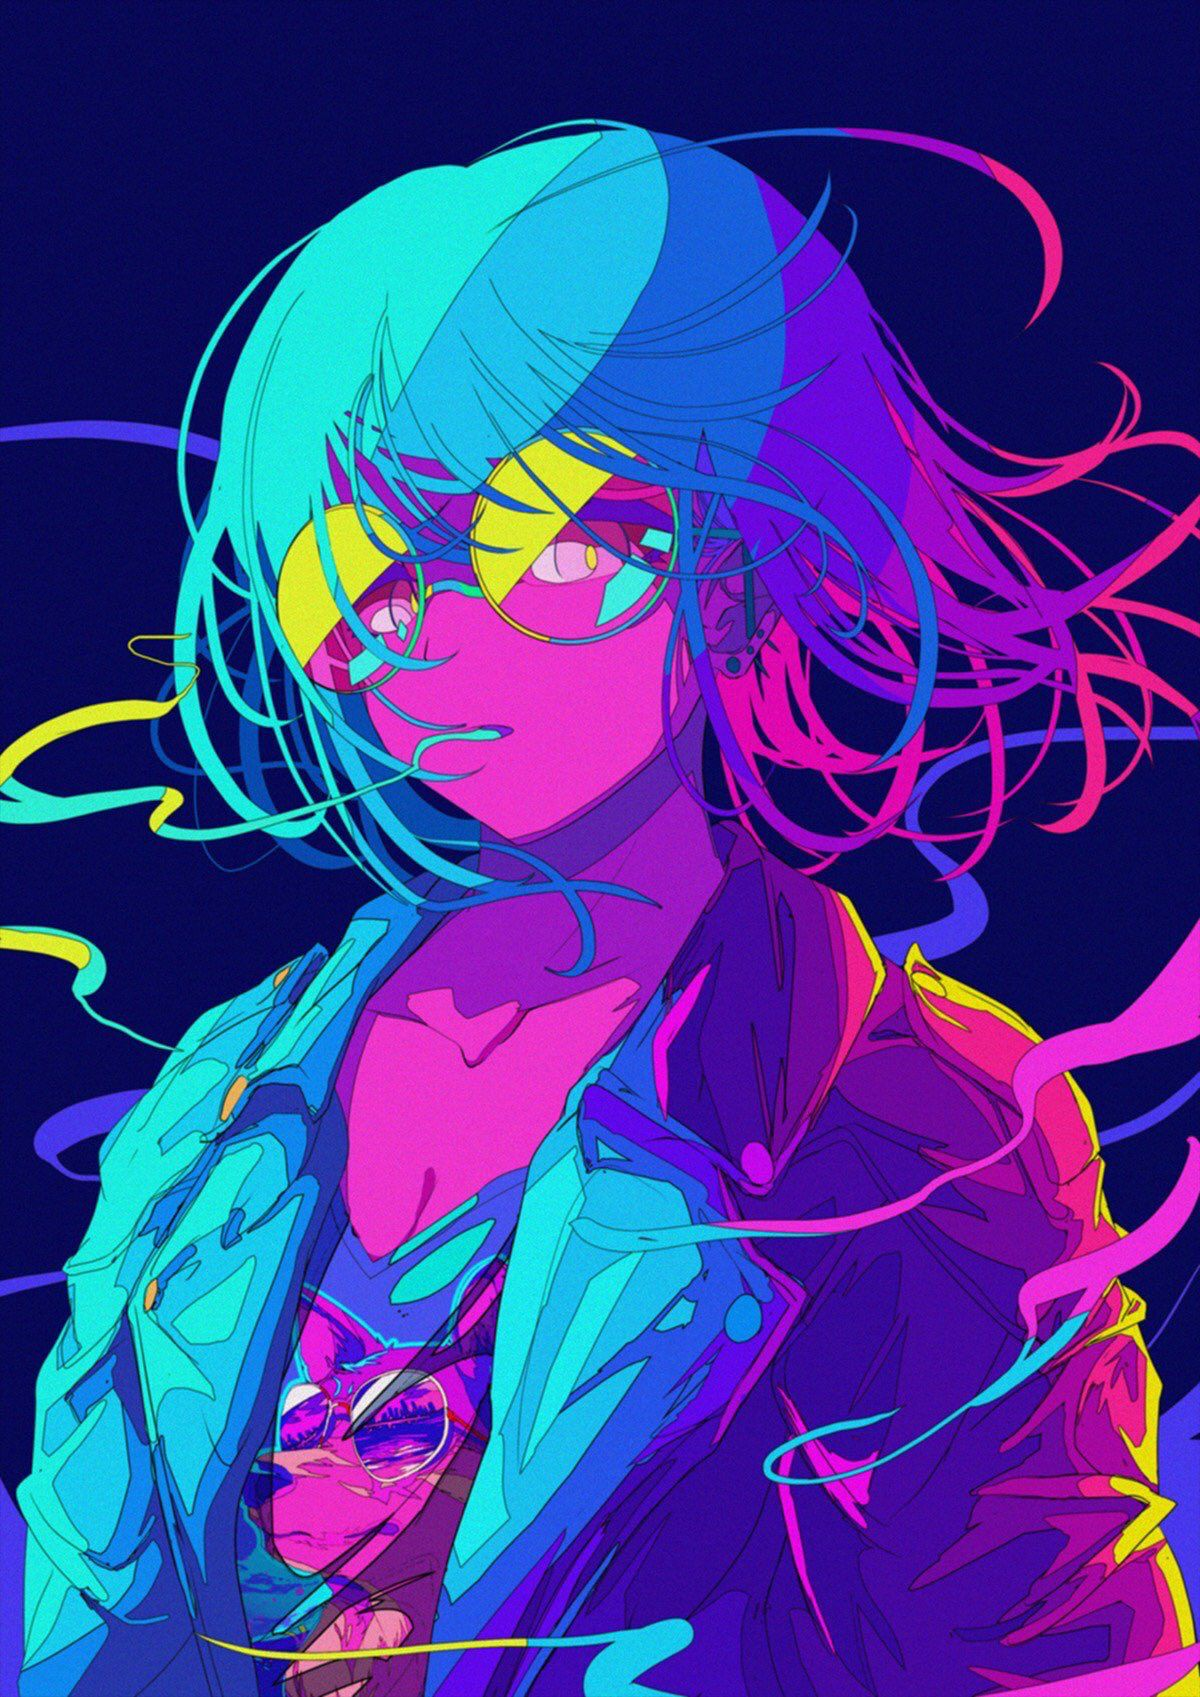 Aesthetic Anime Image By Crystal Ryuu On Anime Anime Art Kawaii Art